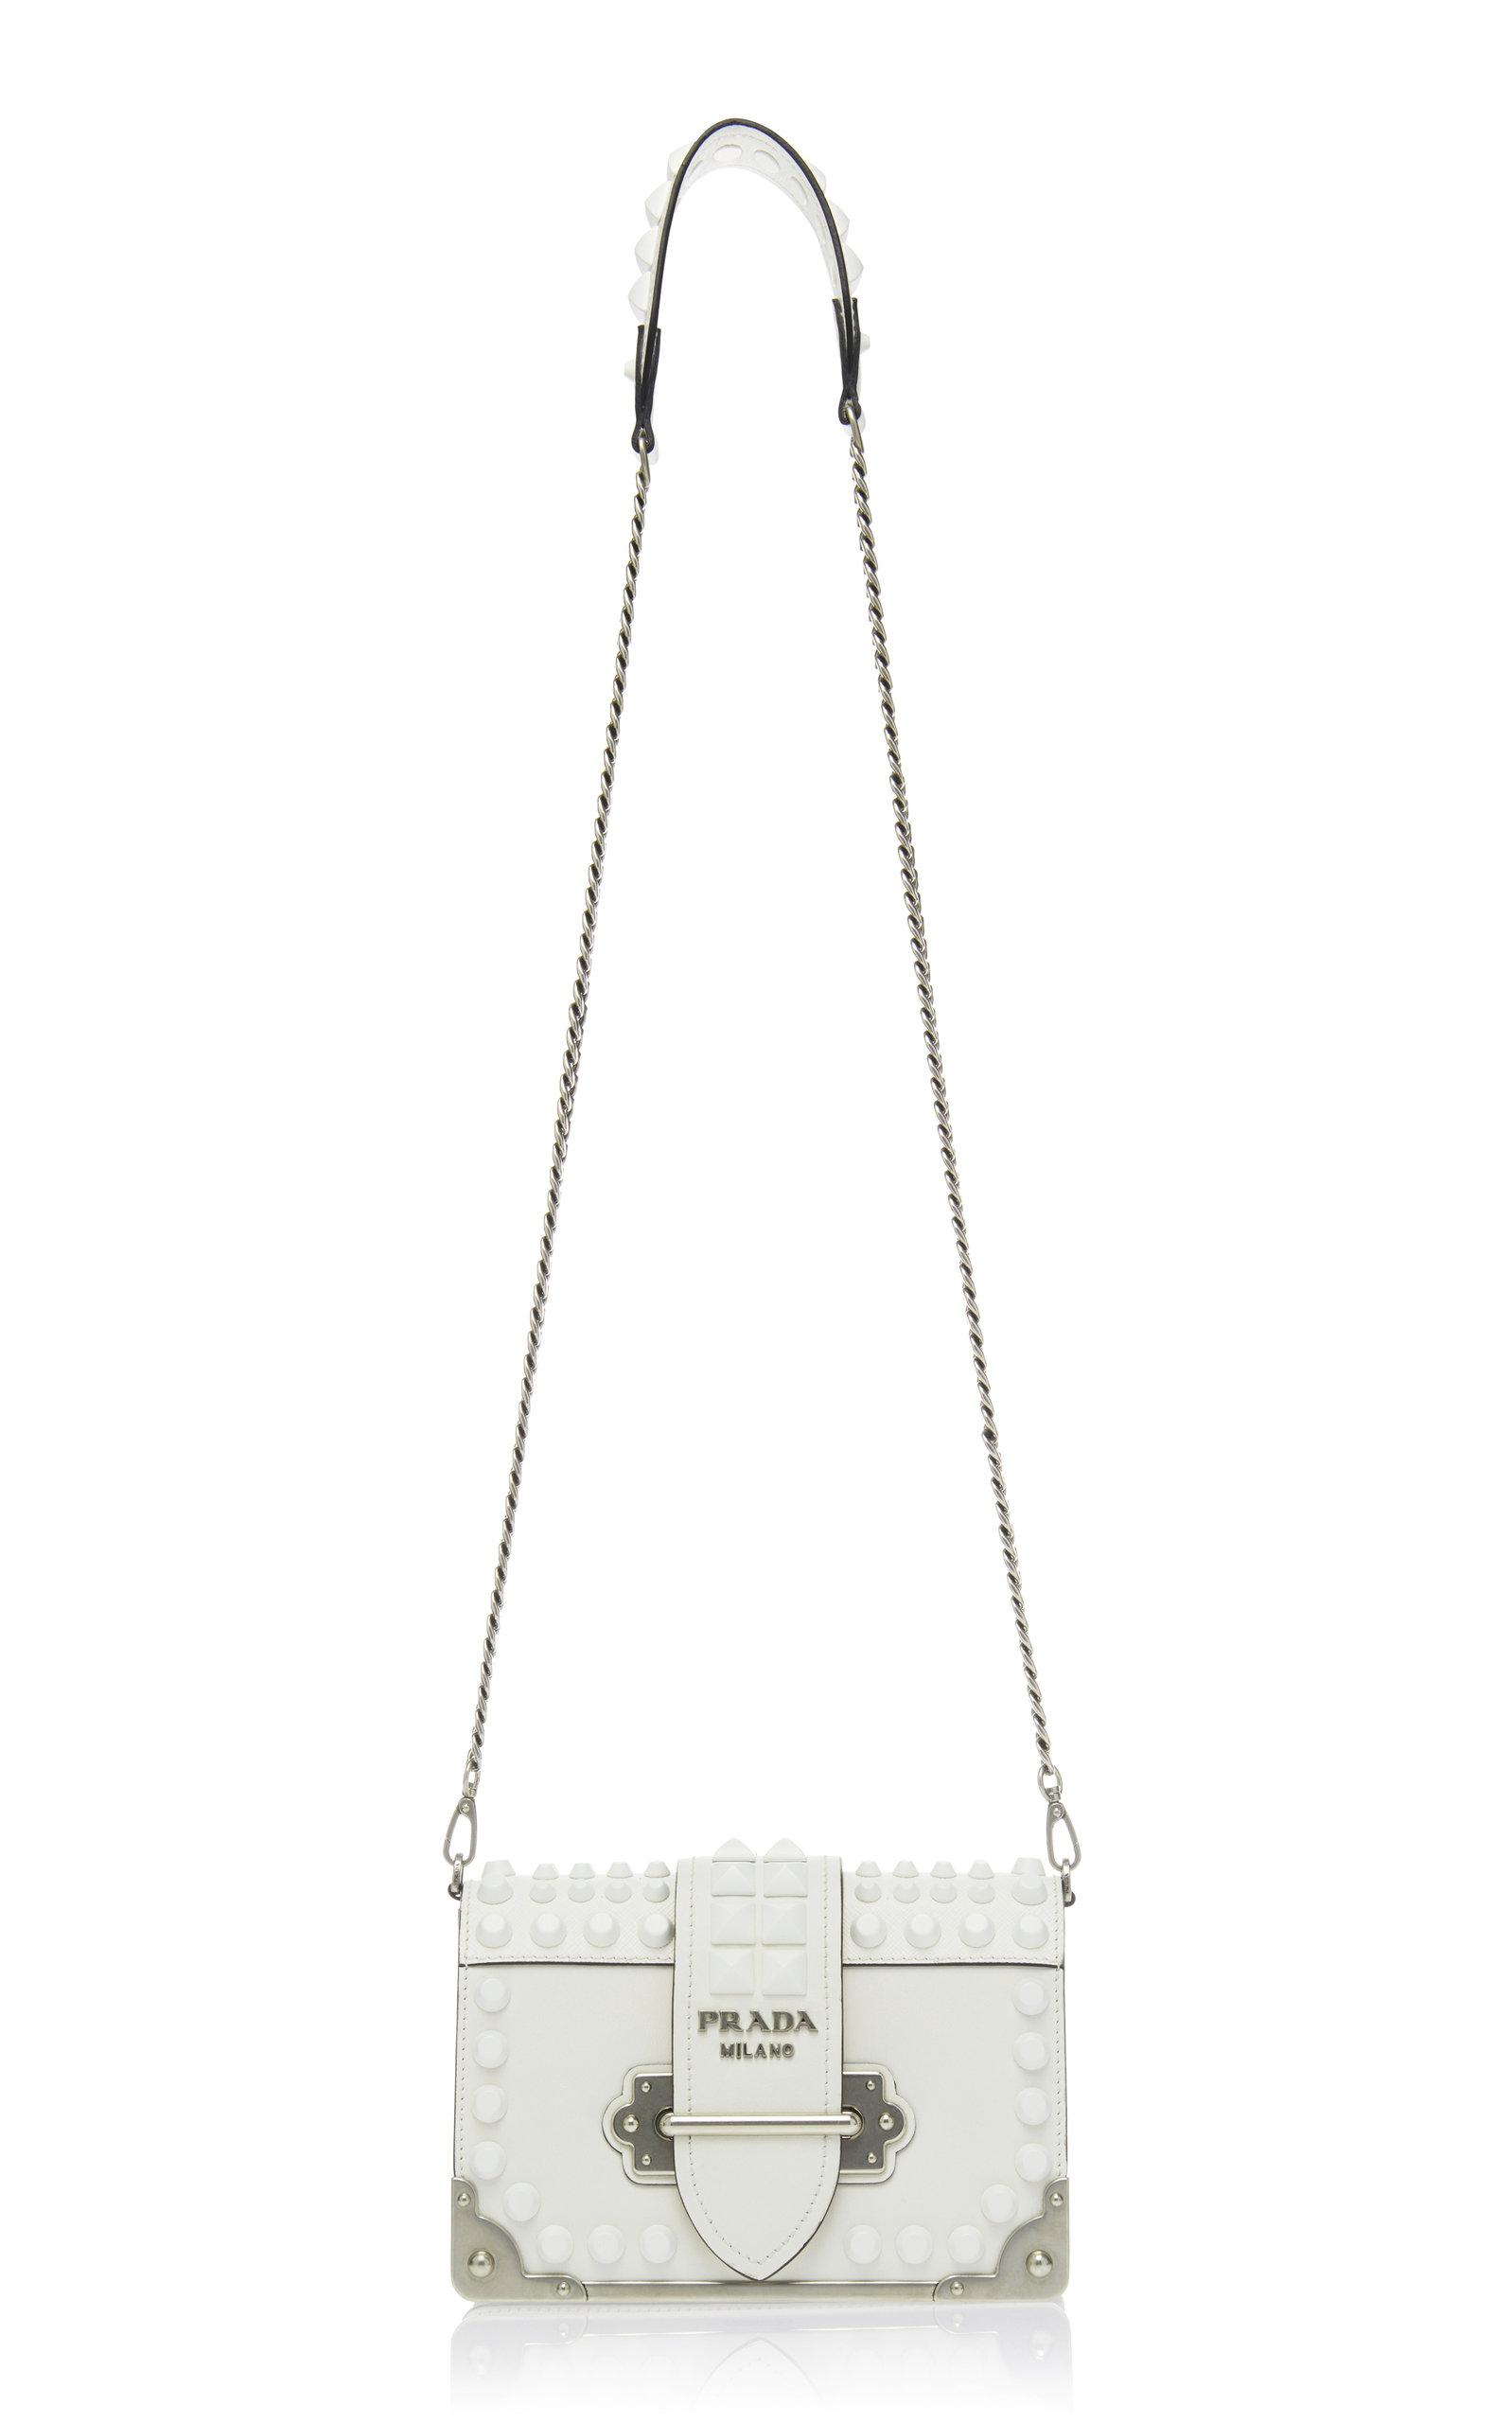 e01fab355100 PradaEmbellished Cahier Leather Shoulder Bag. CLOSE. Loading. Loading